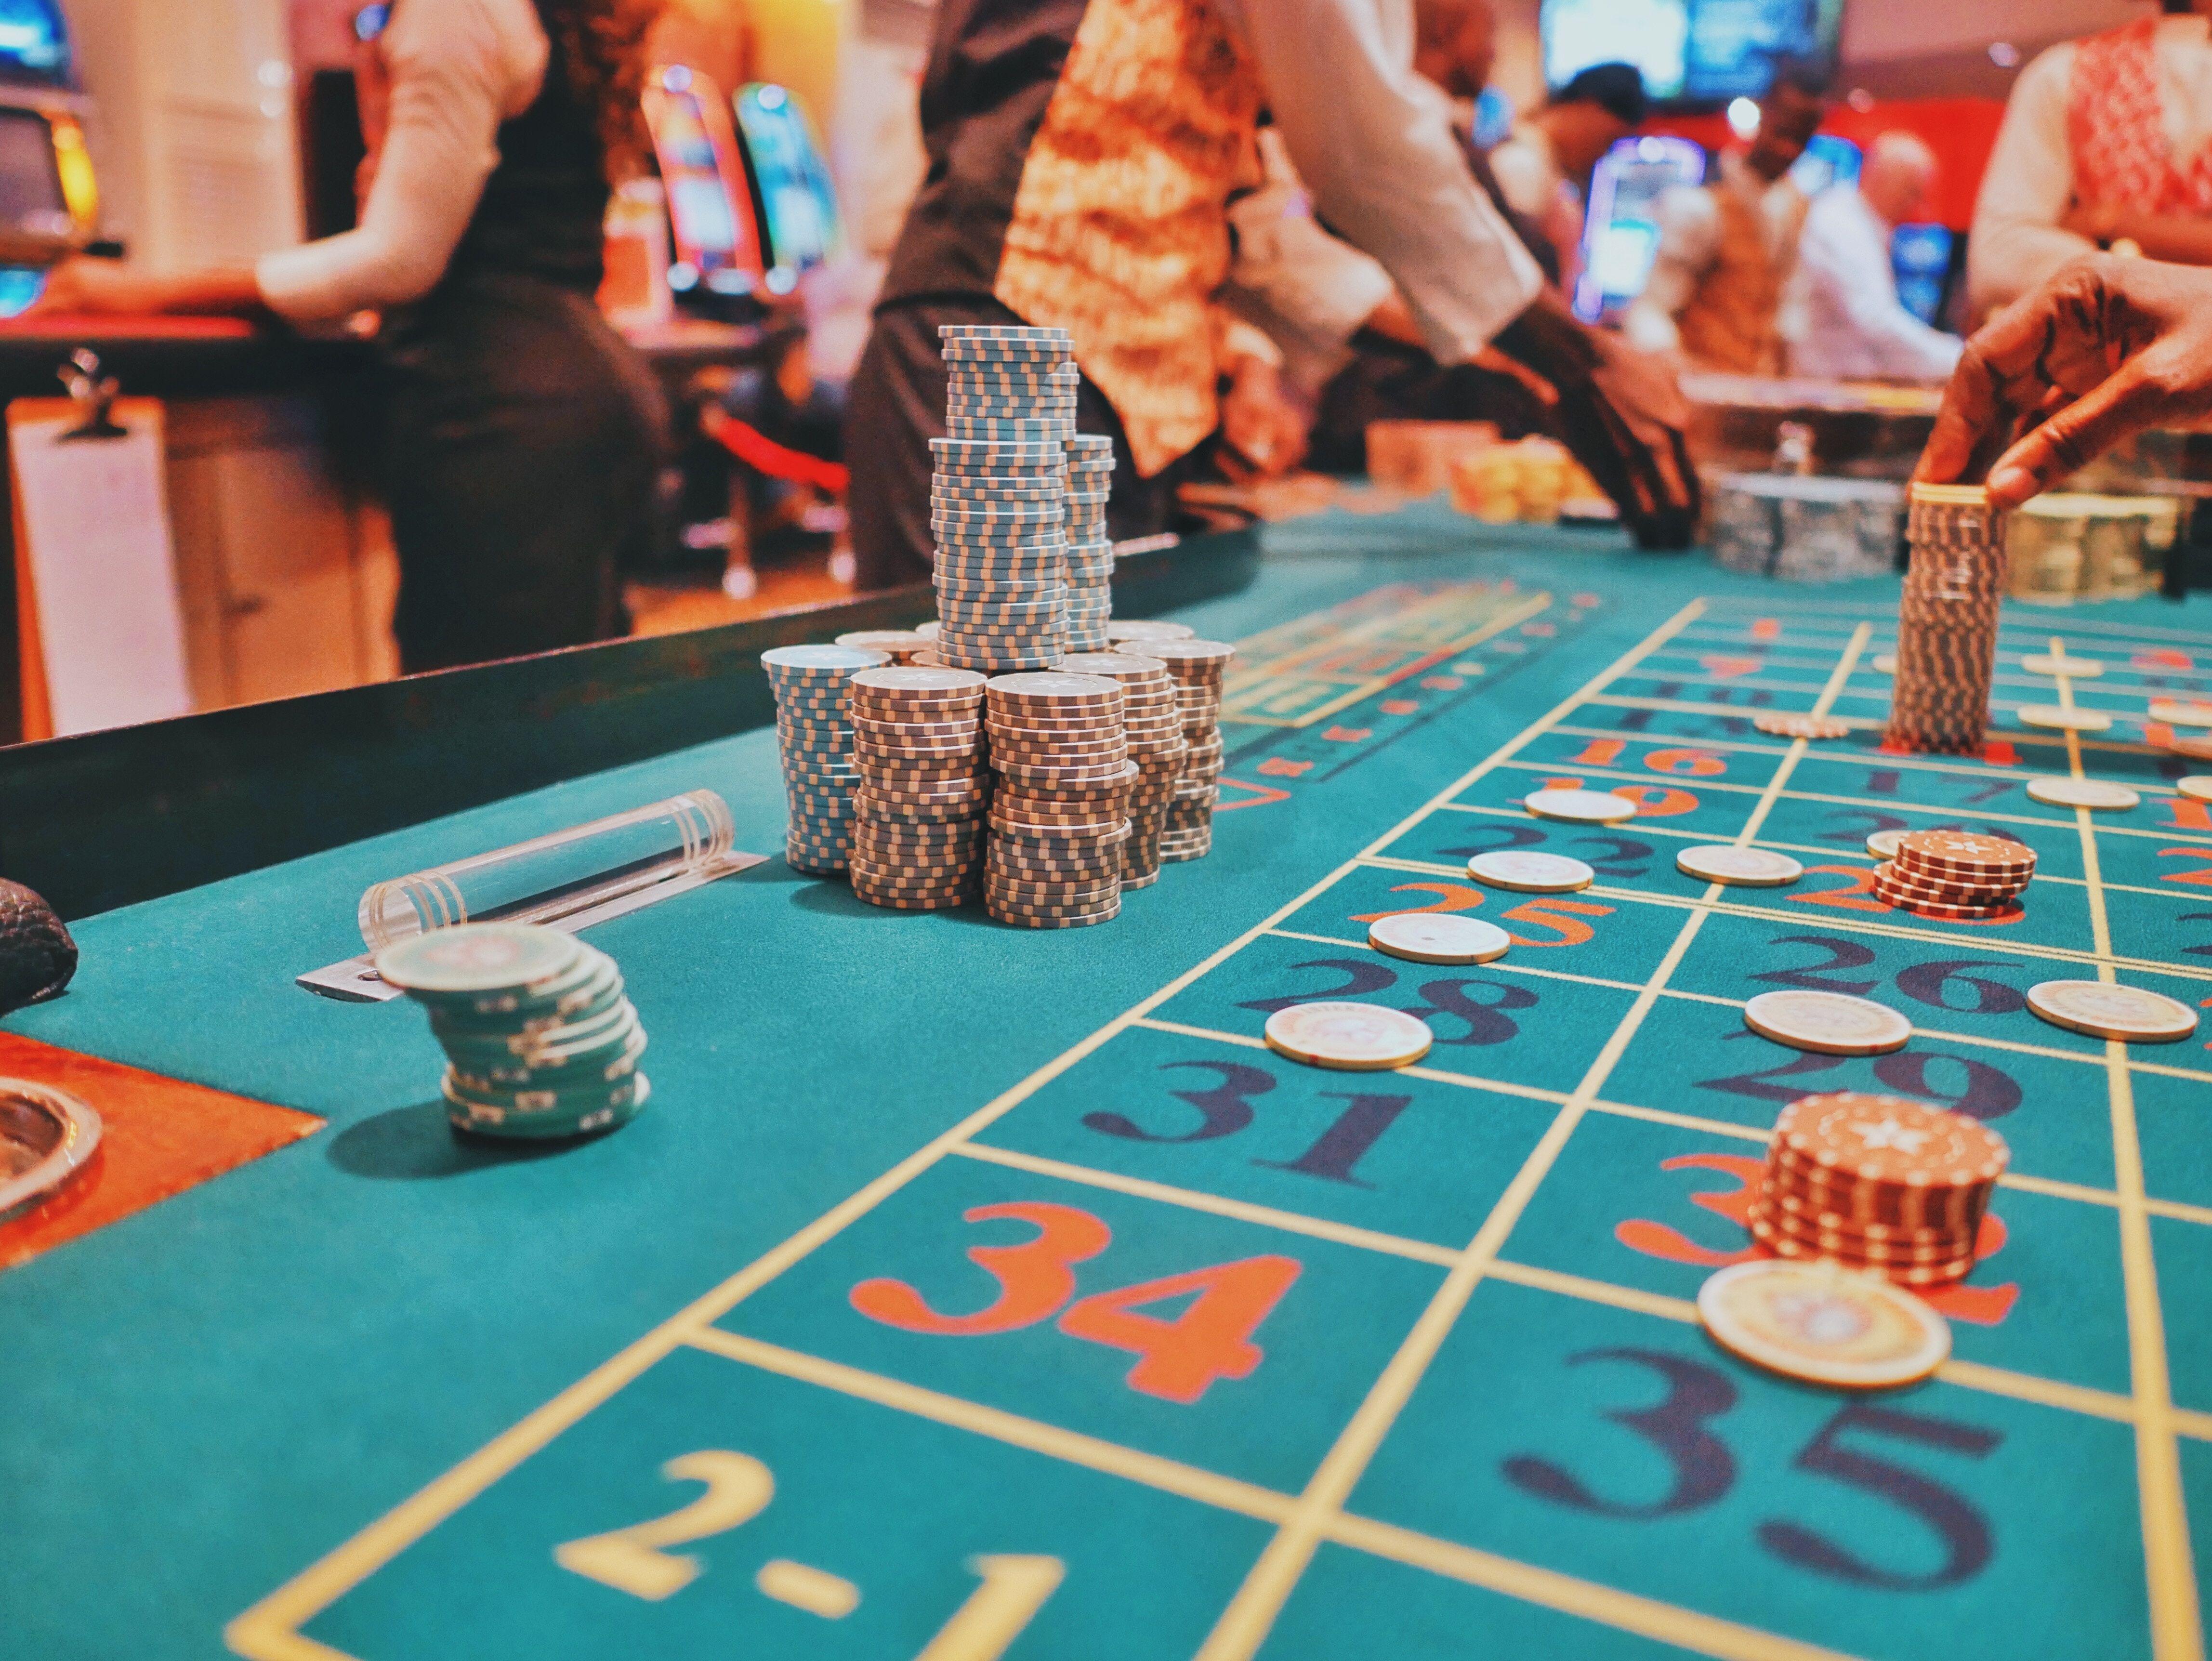 online canadian casinos with no deposit bonus